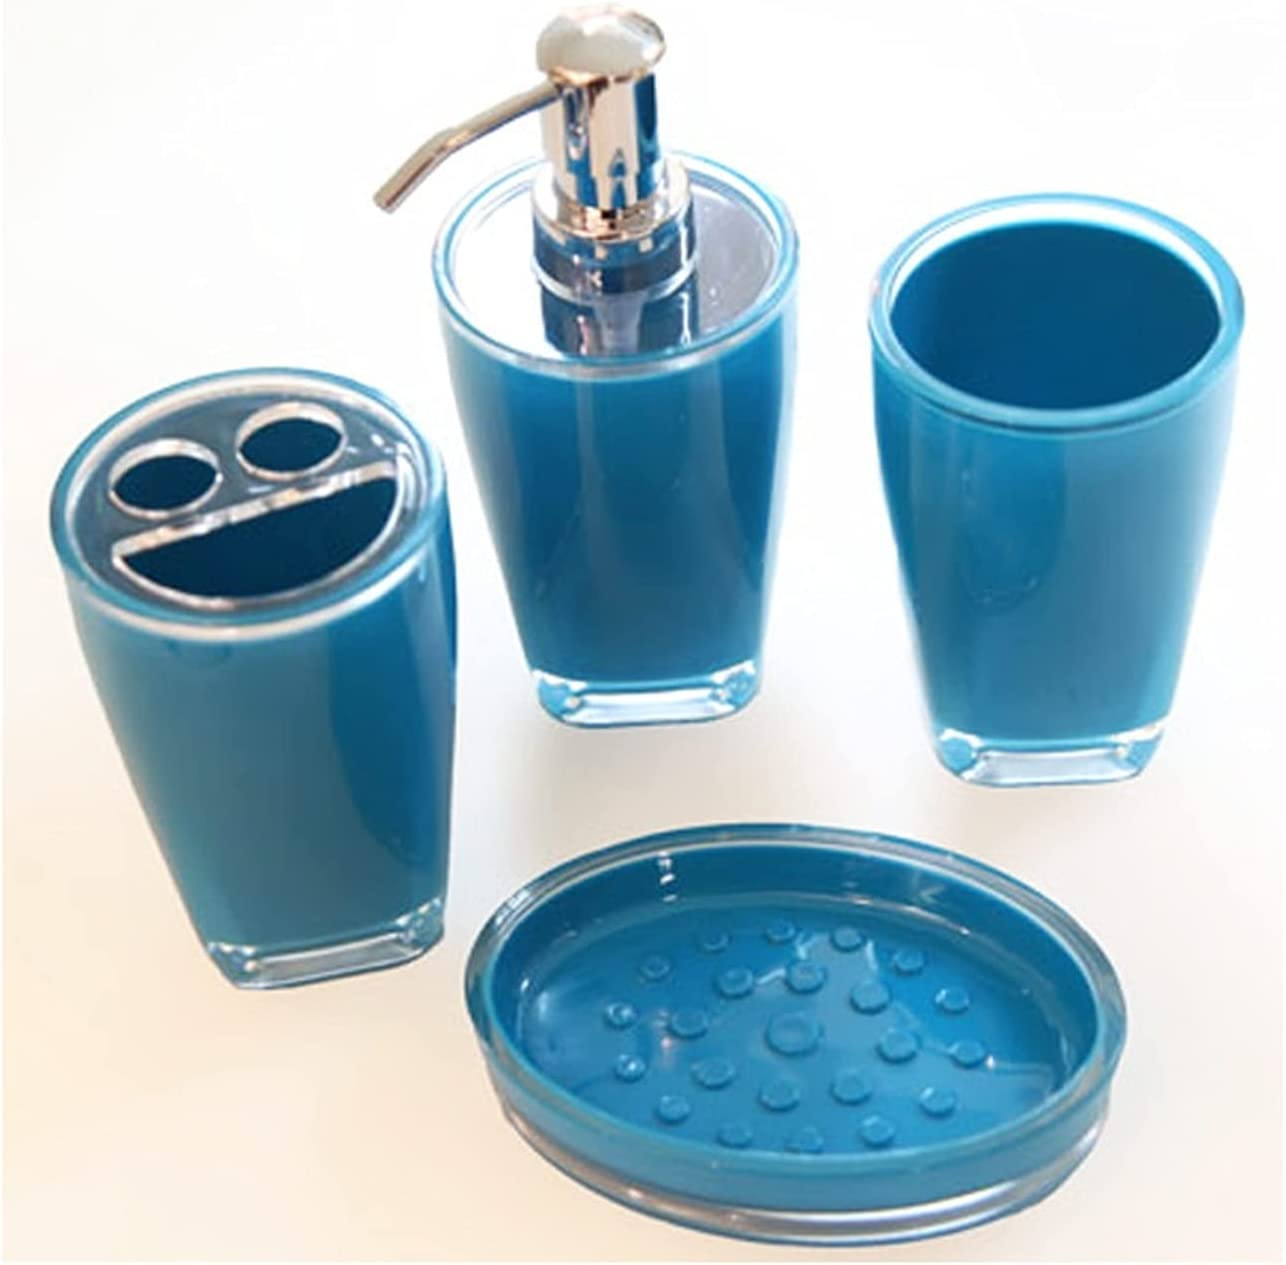 Soap Dispenser Department store Bottle Lotion Refreshing 4-piece Popular overseas Resin